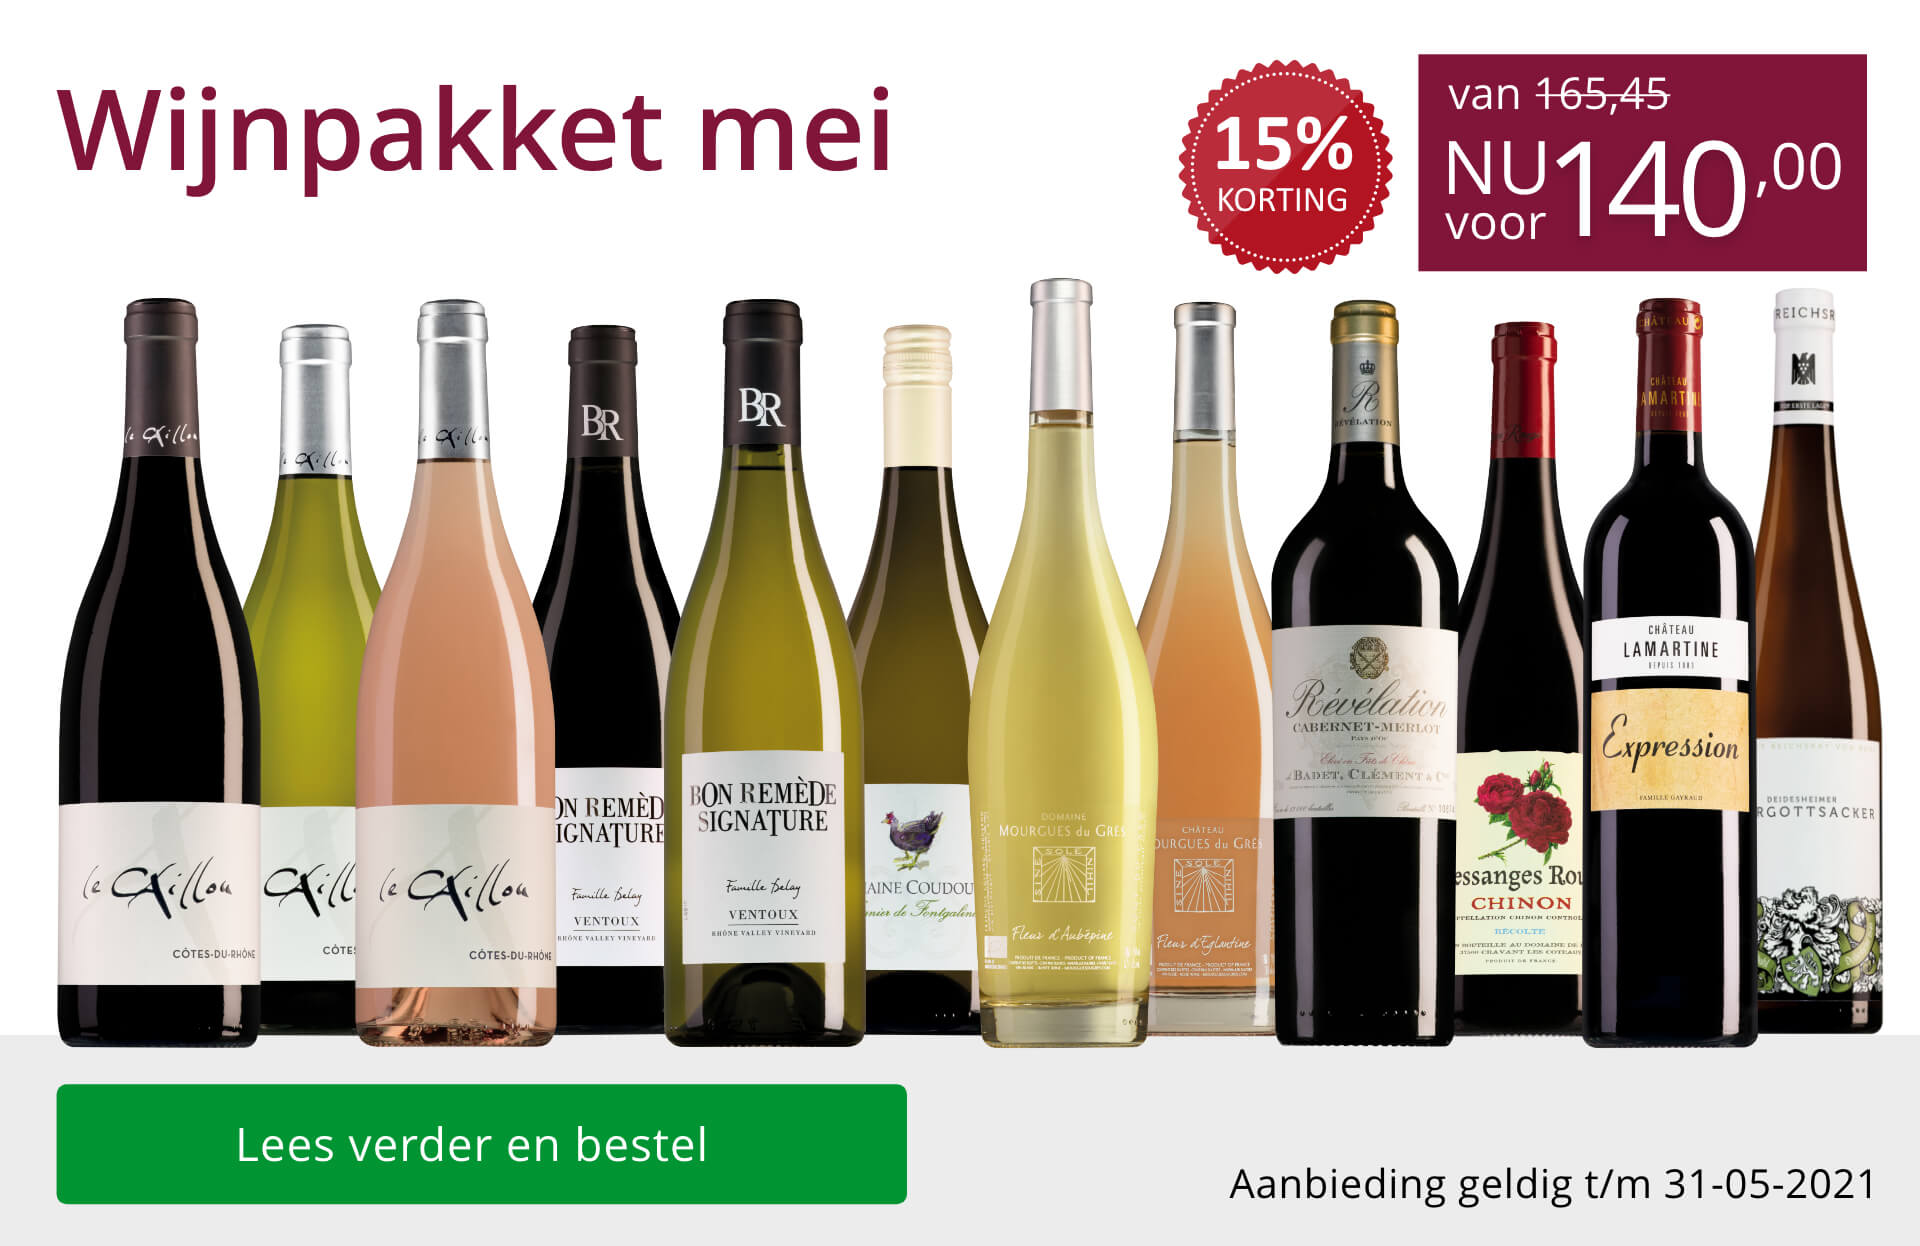 Wijnpakket wijnbericht mei 2021 (140,00) - paars